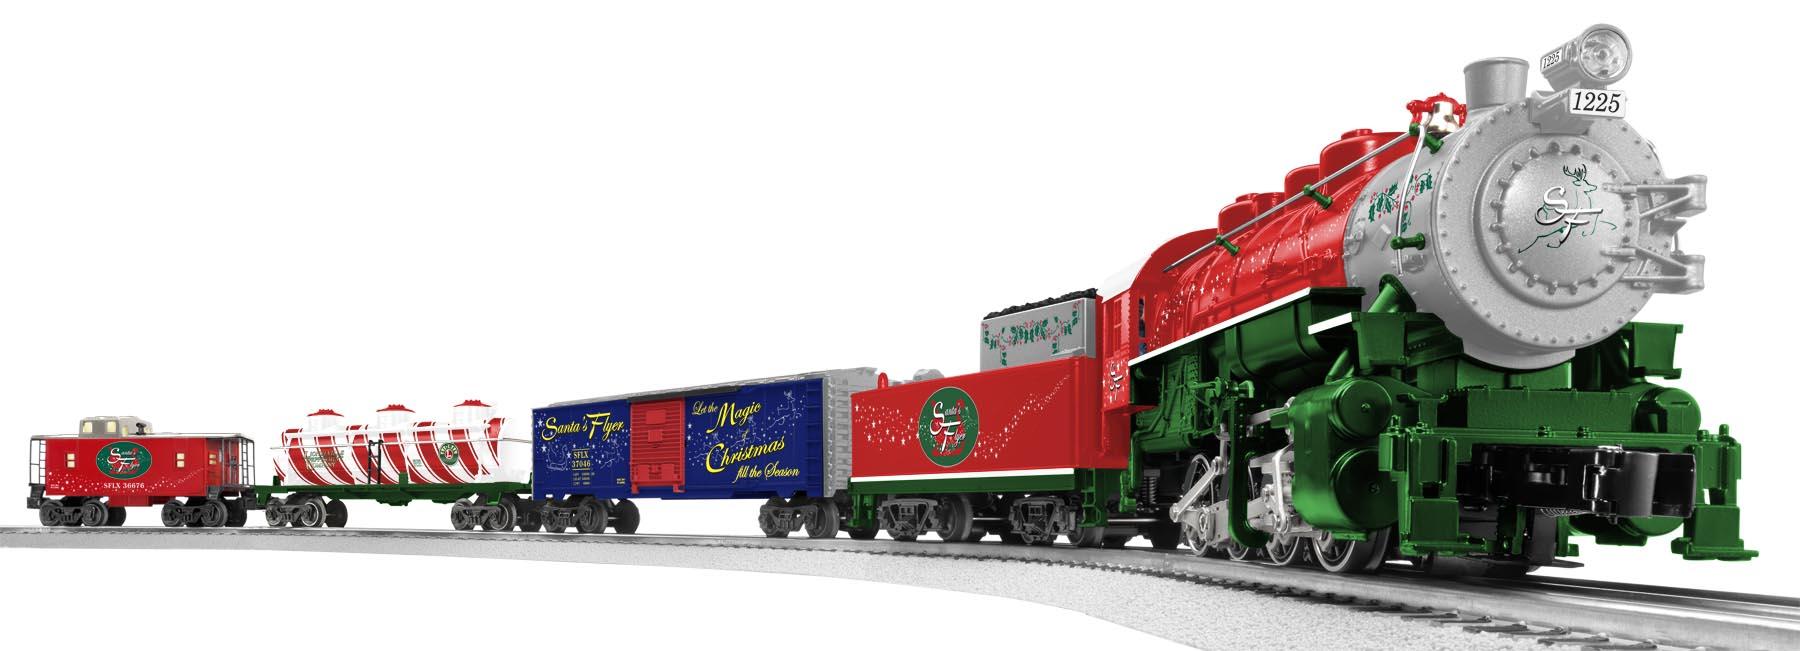 Santa S Flyer Ready To Run Train Set 0 8 0 Steam Loco 1225